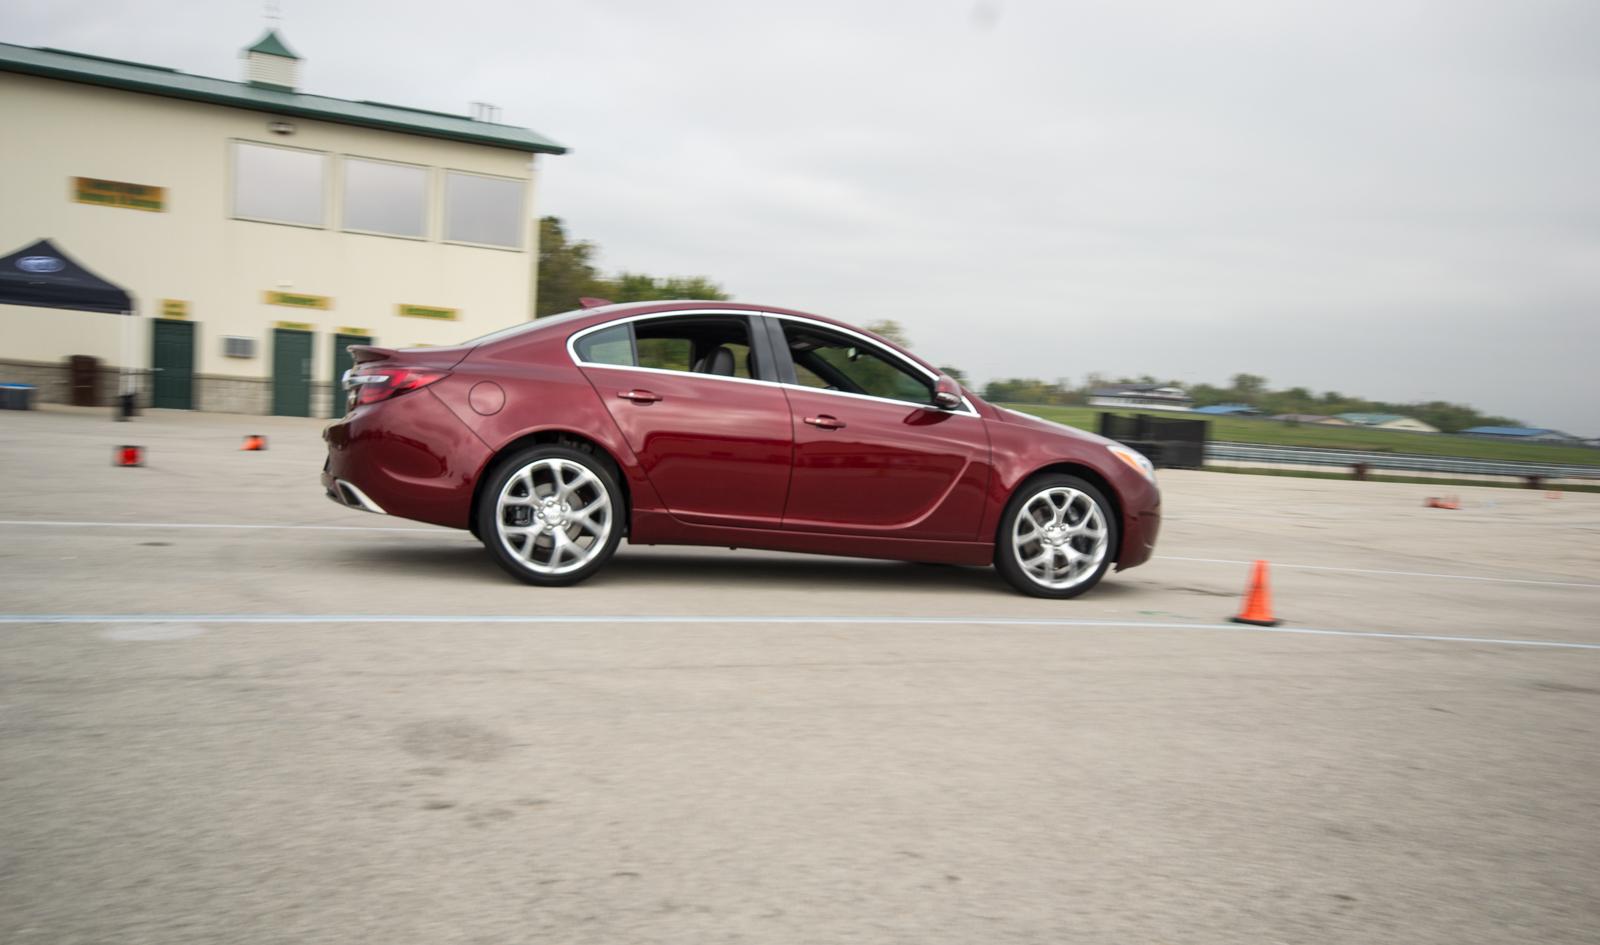 hight resolution of buick regal gs autocross 4